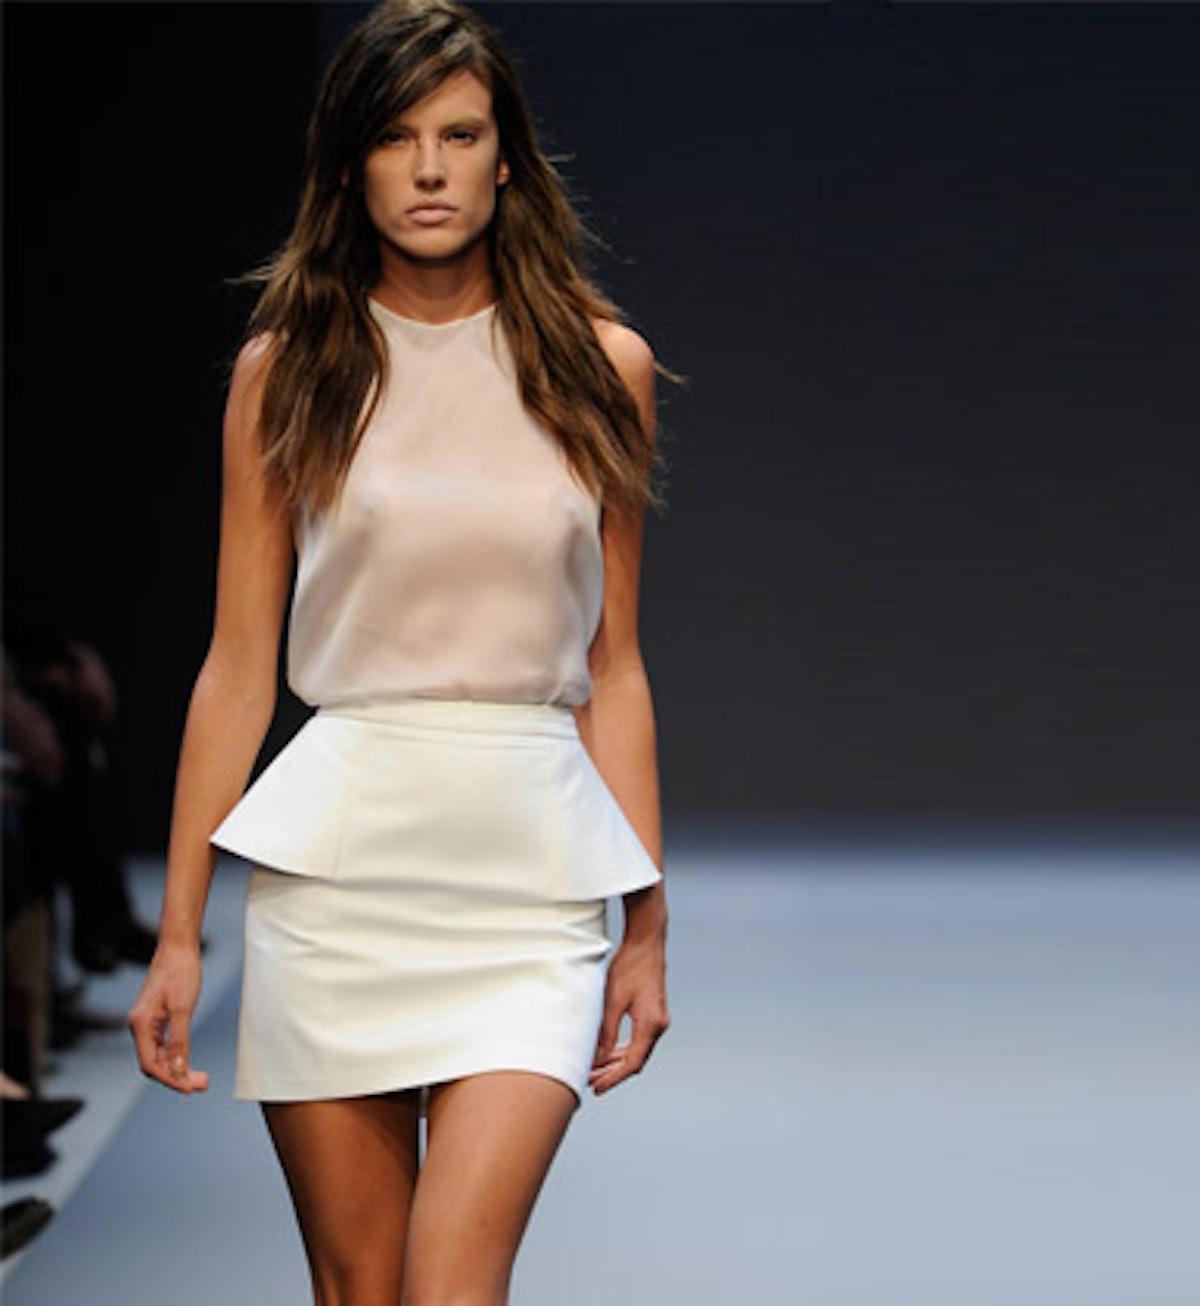 blog_model_alessandra_ambrosio_07.jpg